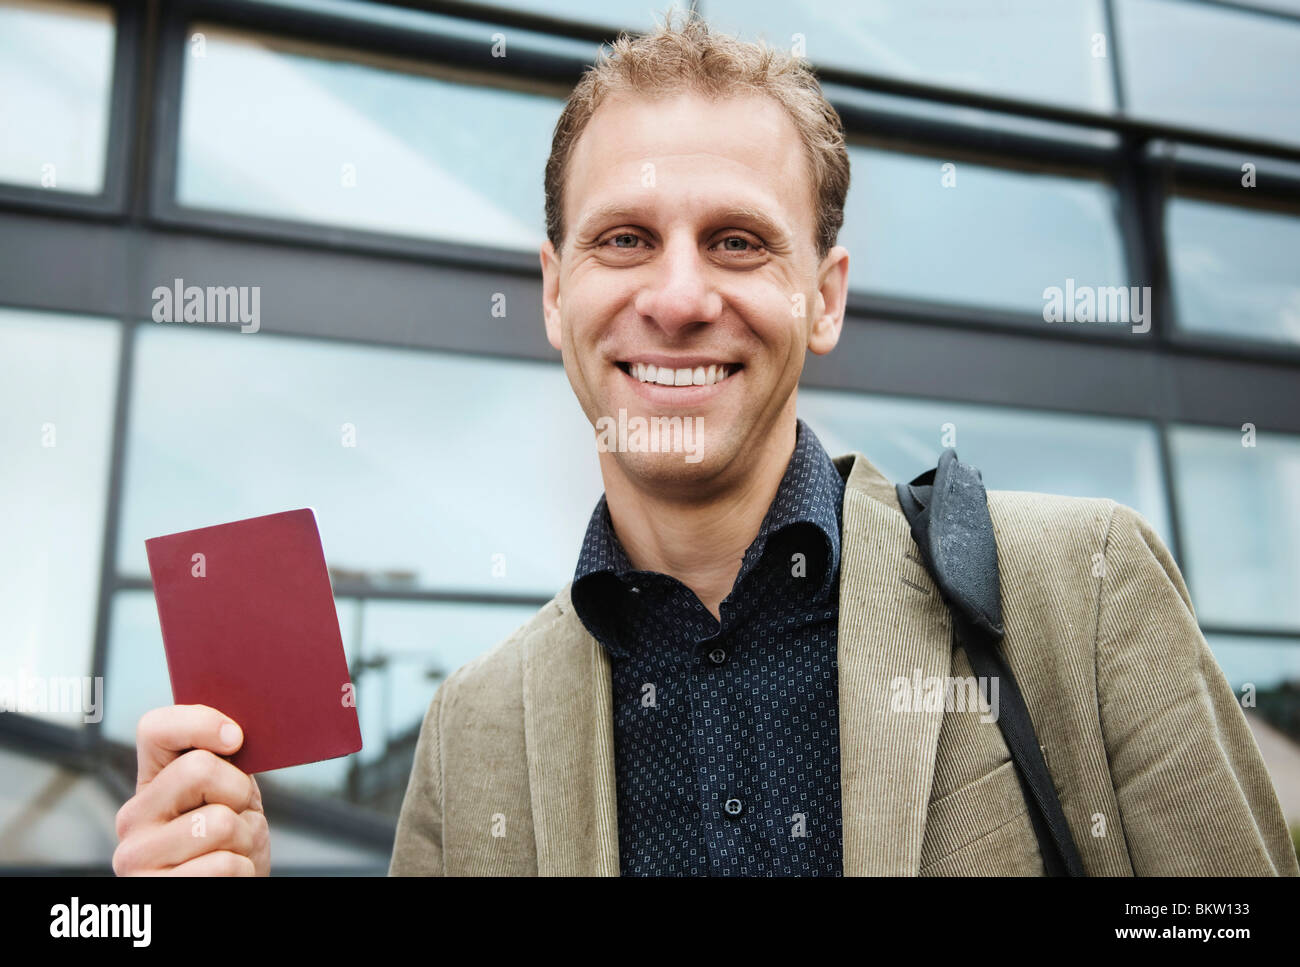 Man holding passport - Stock Image